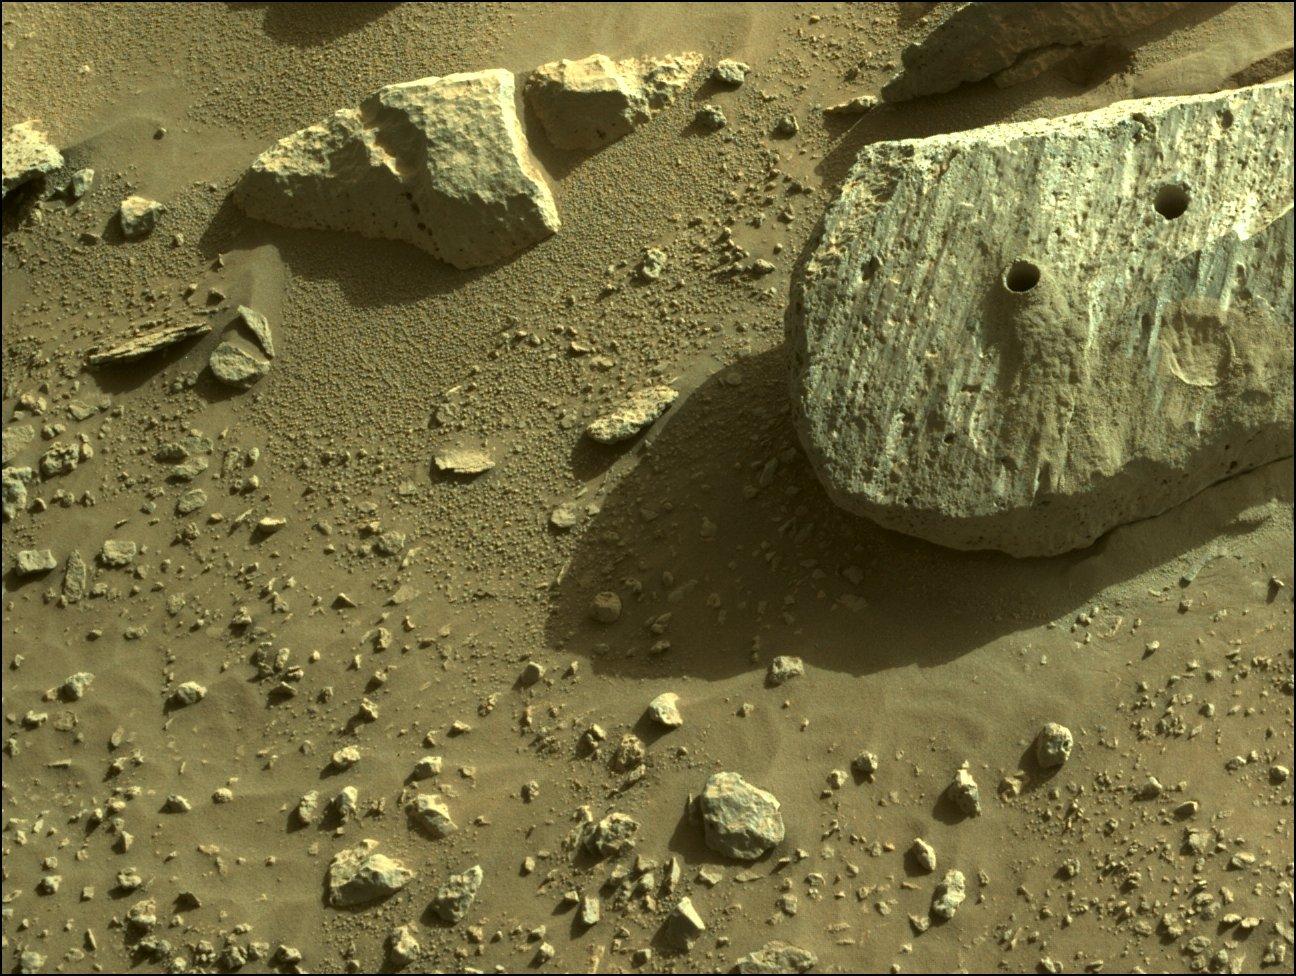 Mars 2020 (Perseverance - Ingenuity) : exploration du cratère Jezero - Page 21 12140